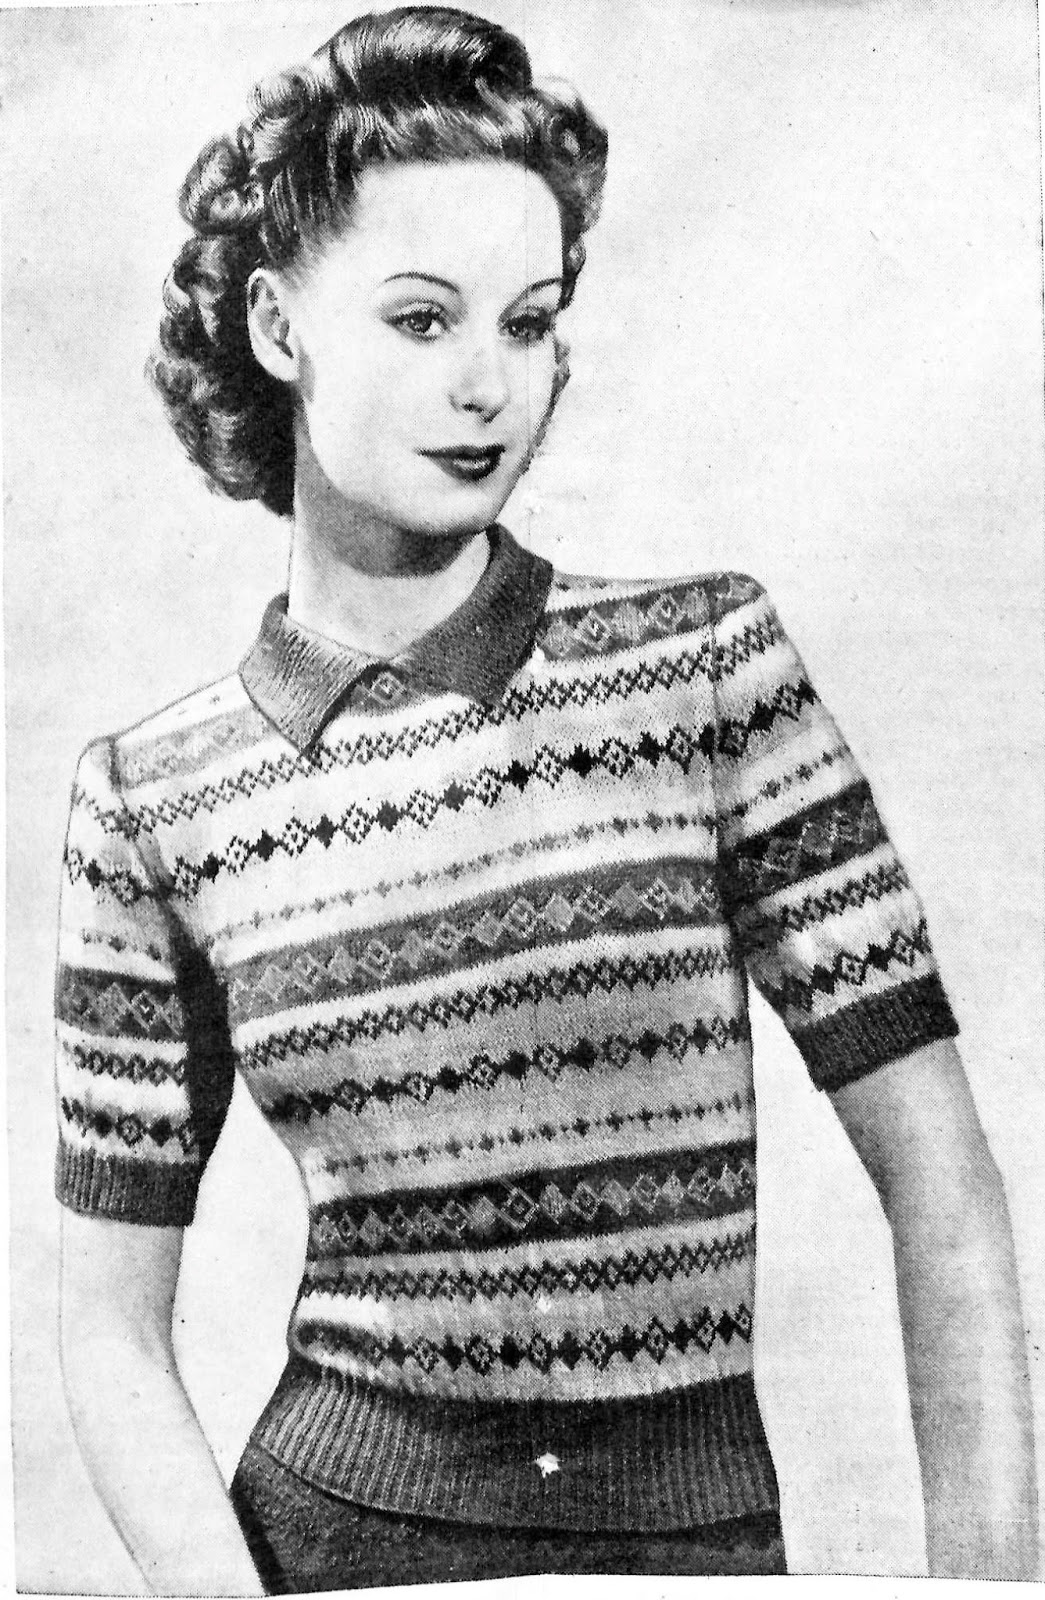 The Vintage Pattern Files: October 2015